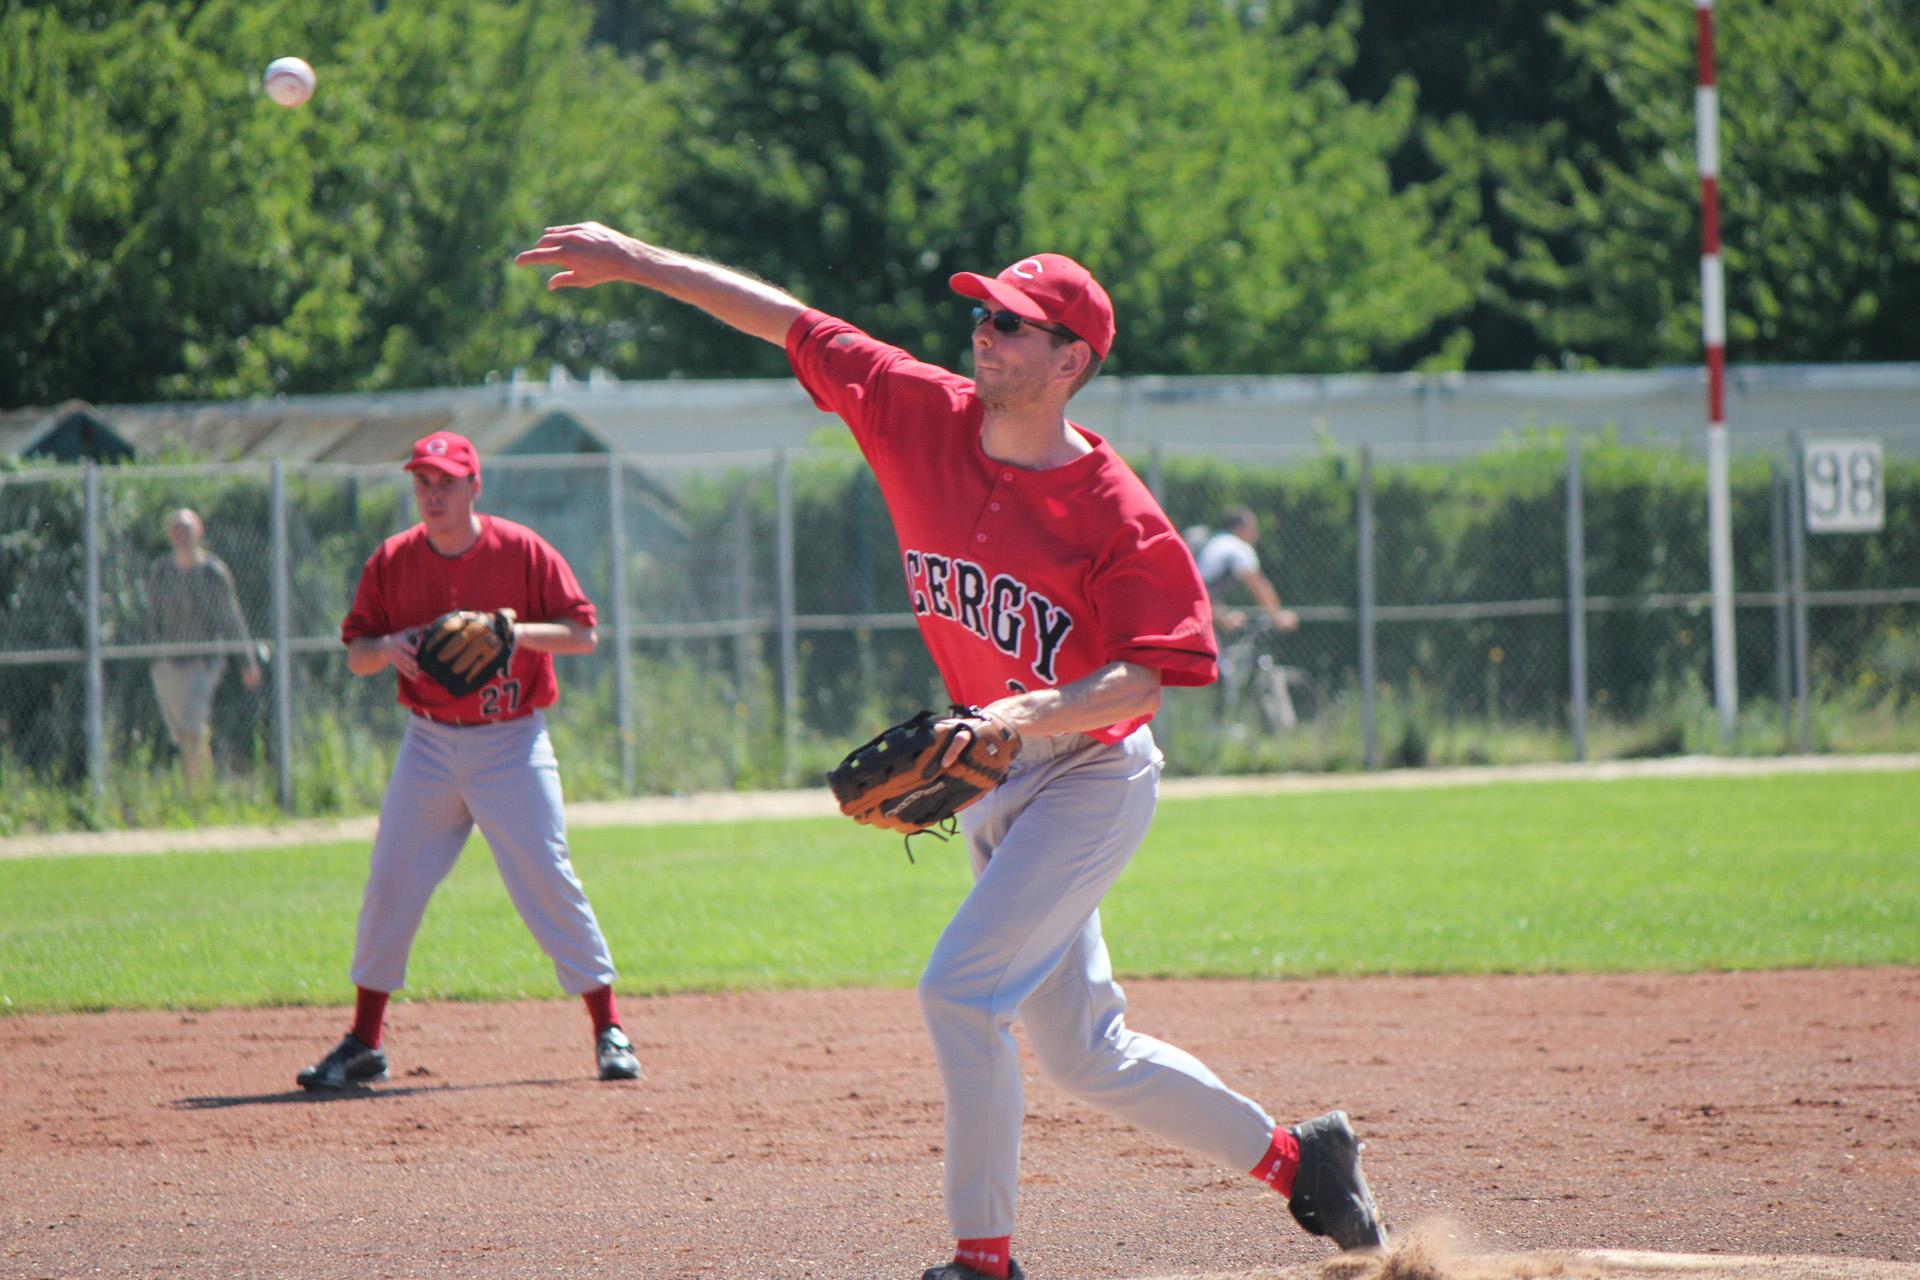 2011-06-26 Baseball (4)